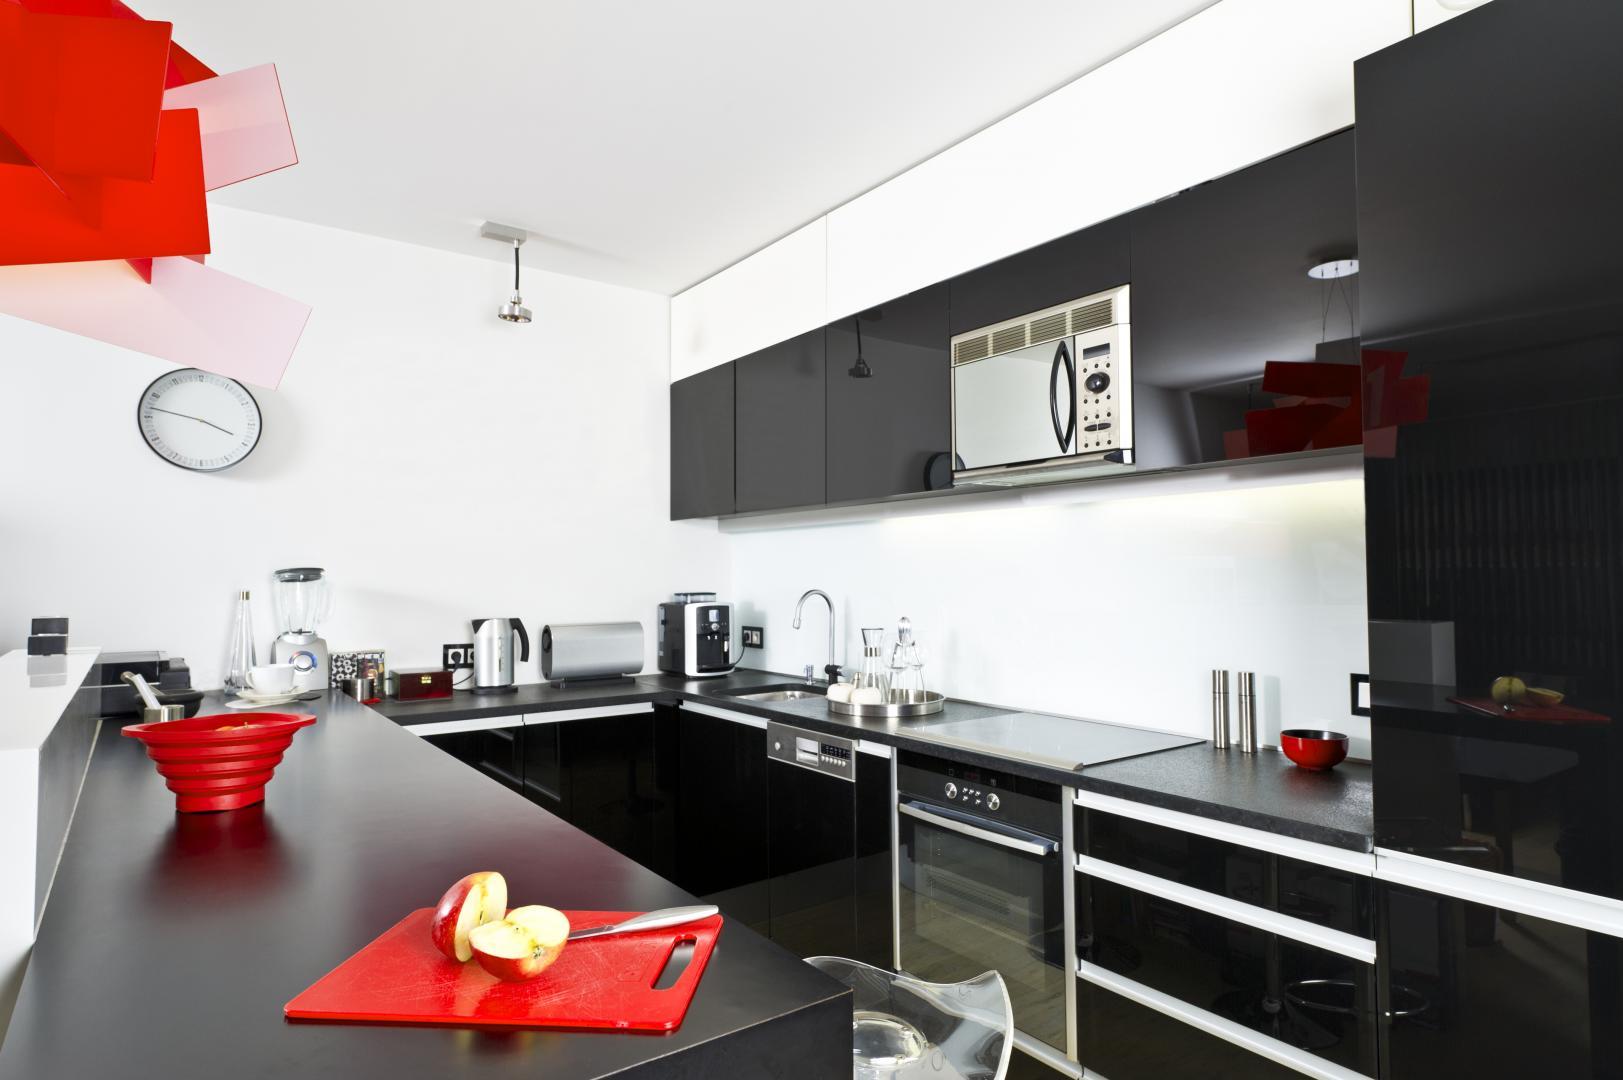 cuisiniste calvisson-cuisine equipee nimes-salle de bain gard-dressing sur mesure caveirac-store calvisson-installateur de cuisines nimes-menuisier d agencement gard